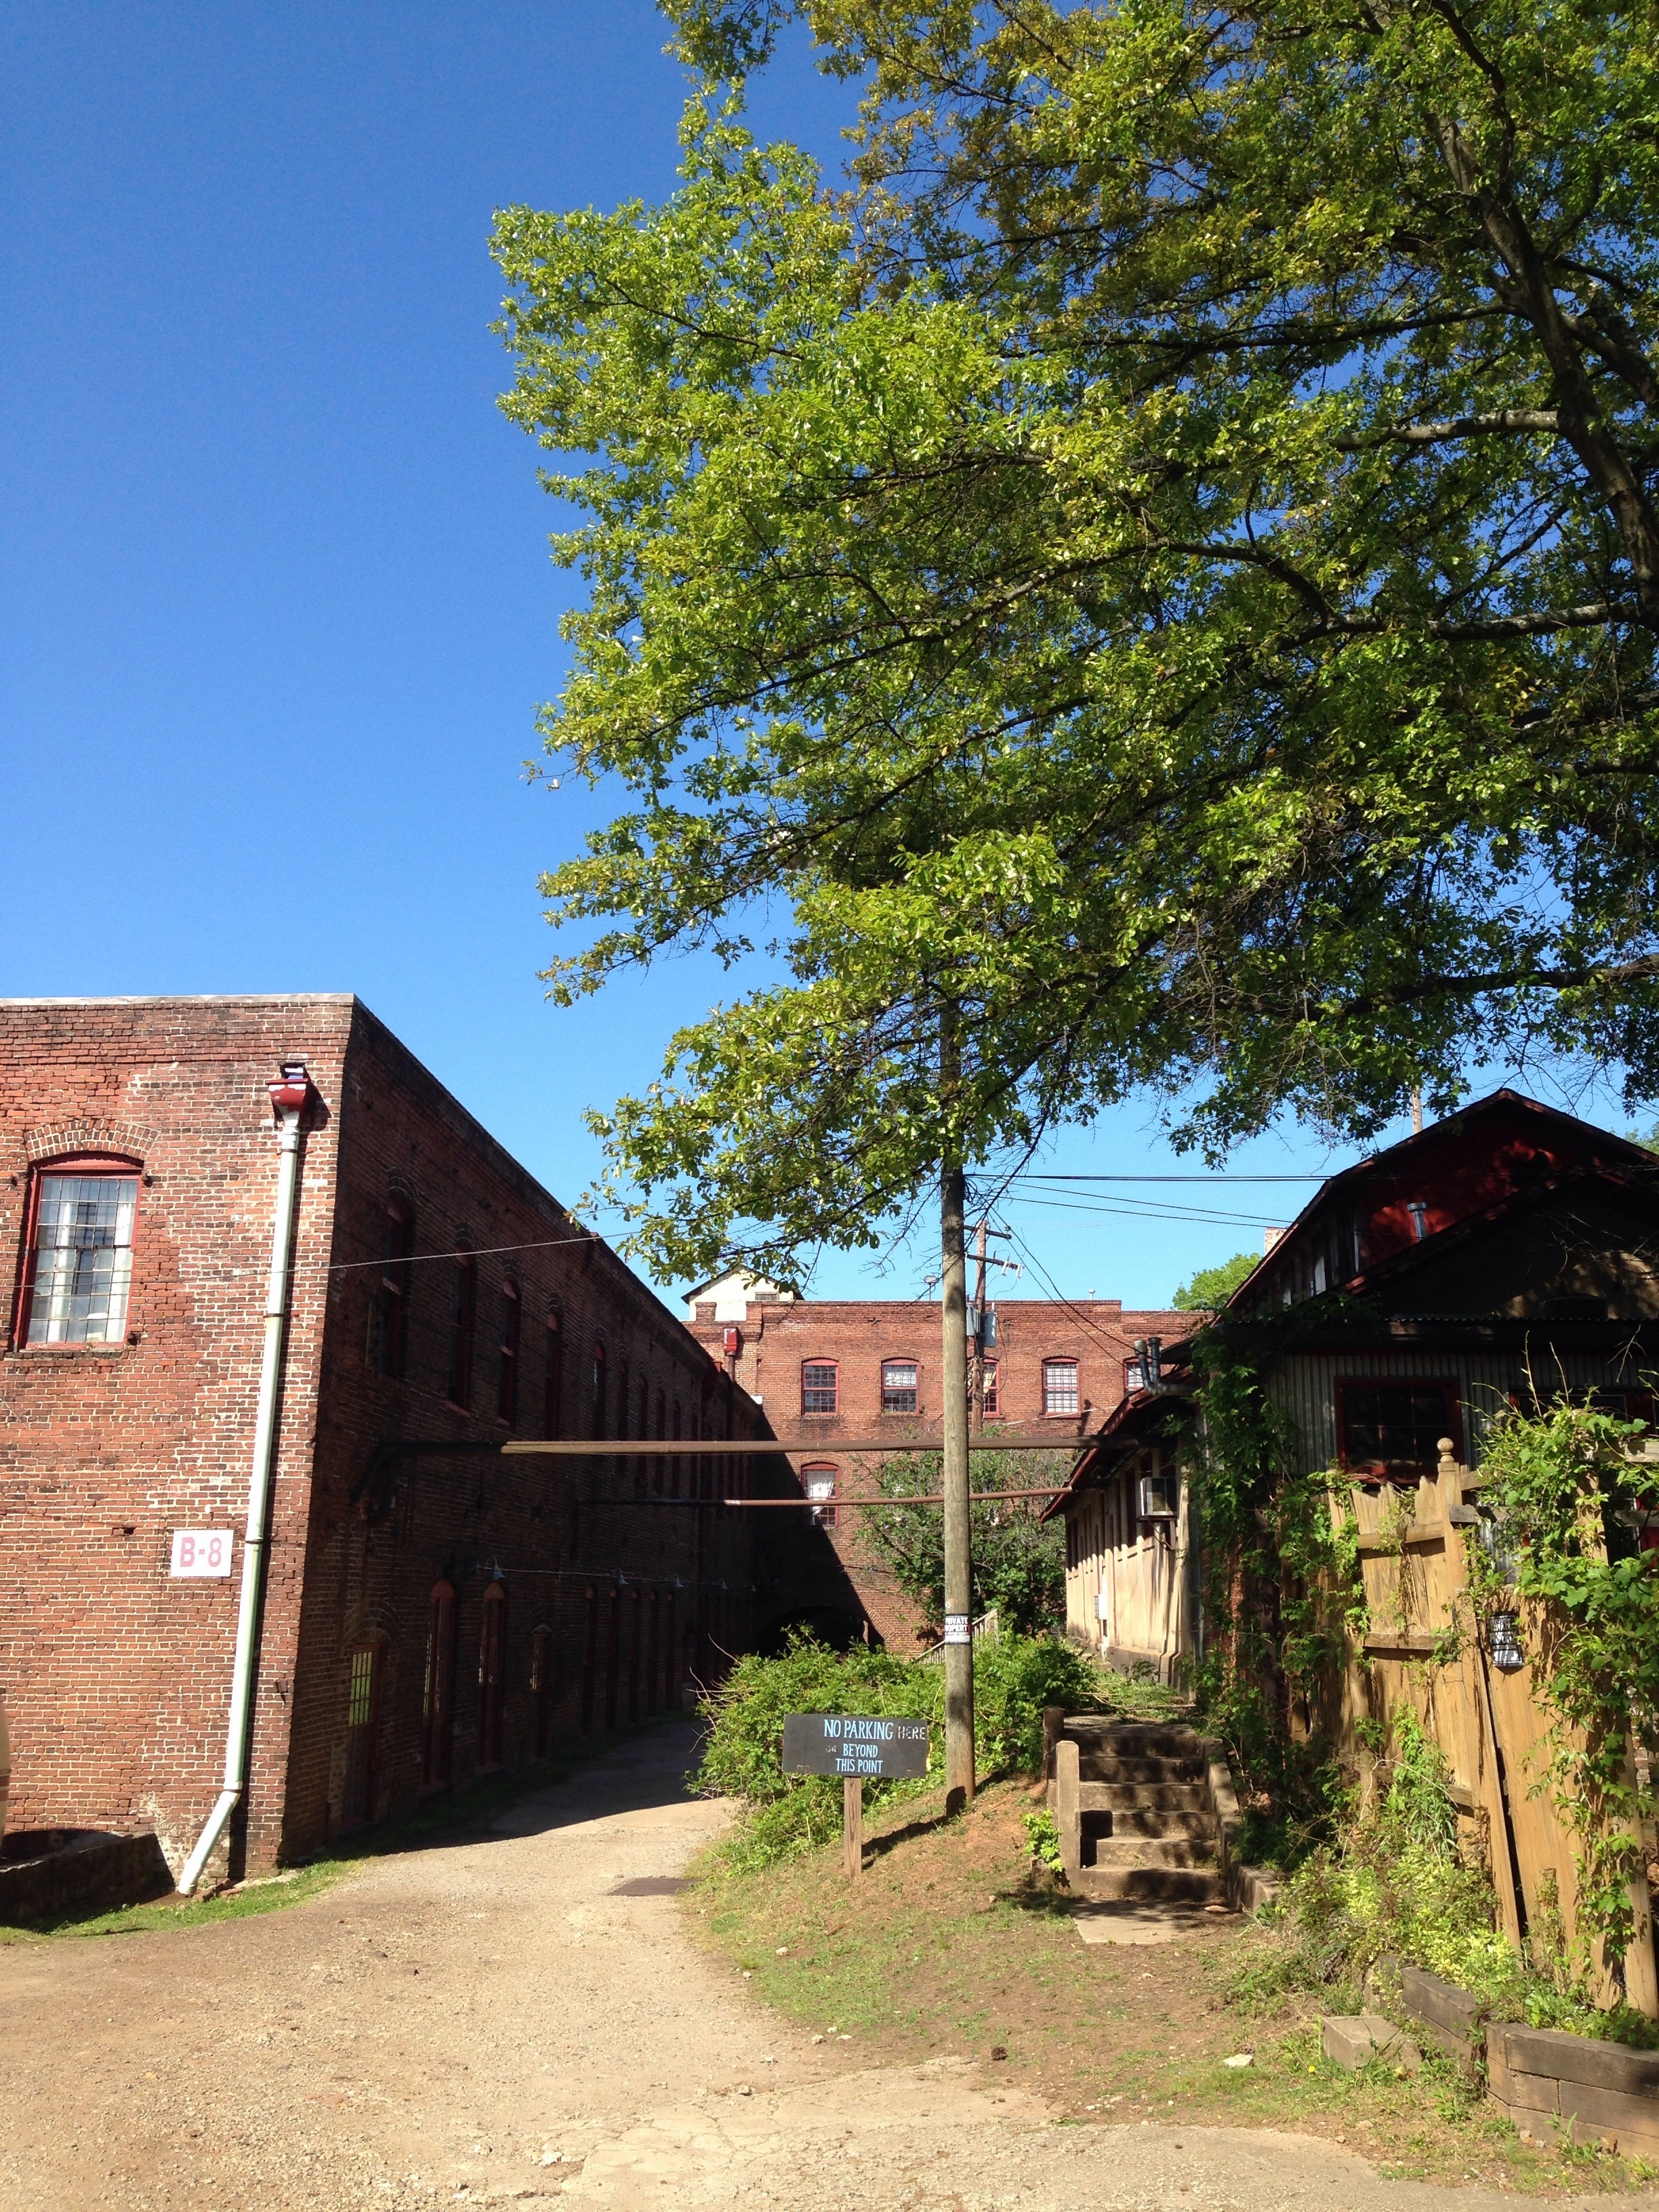 The Goat Farm Arts Center